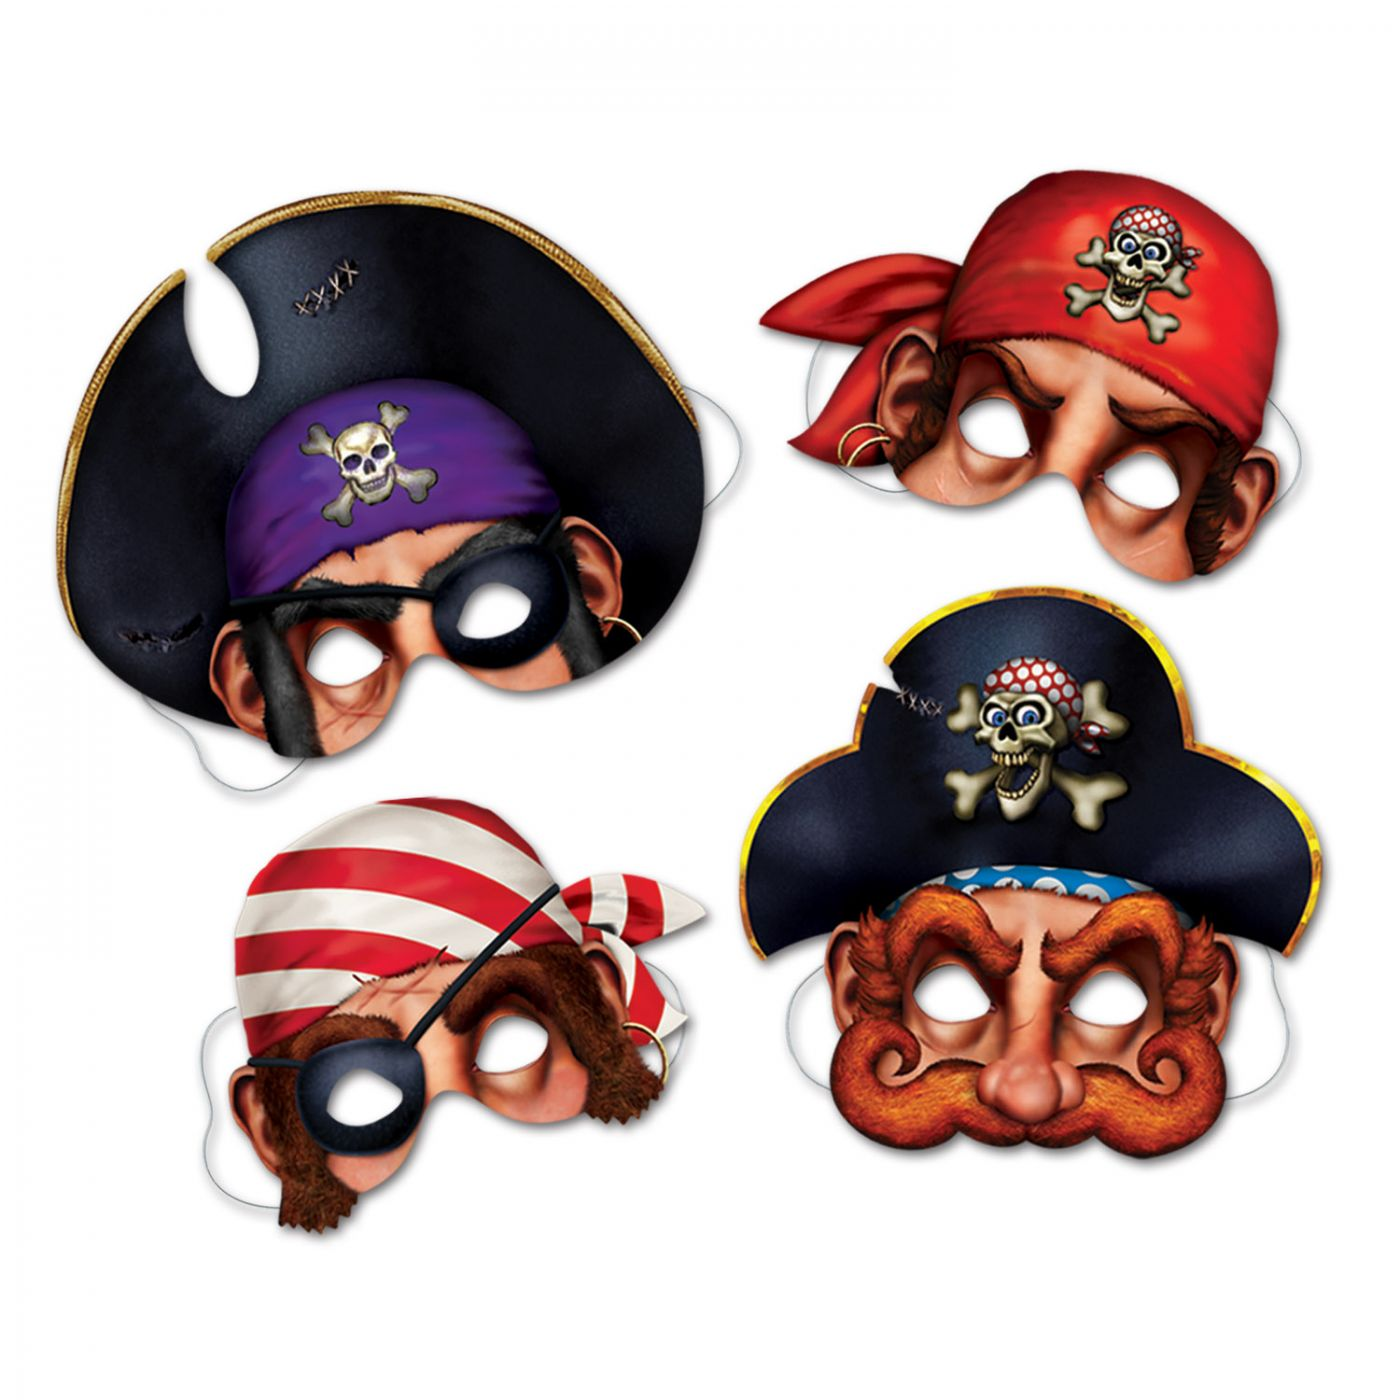 Pirate Masks image